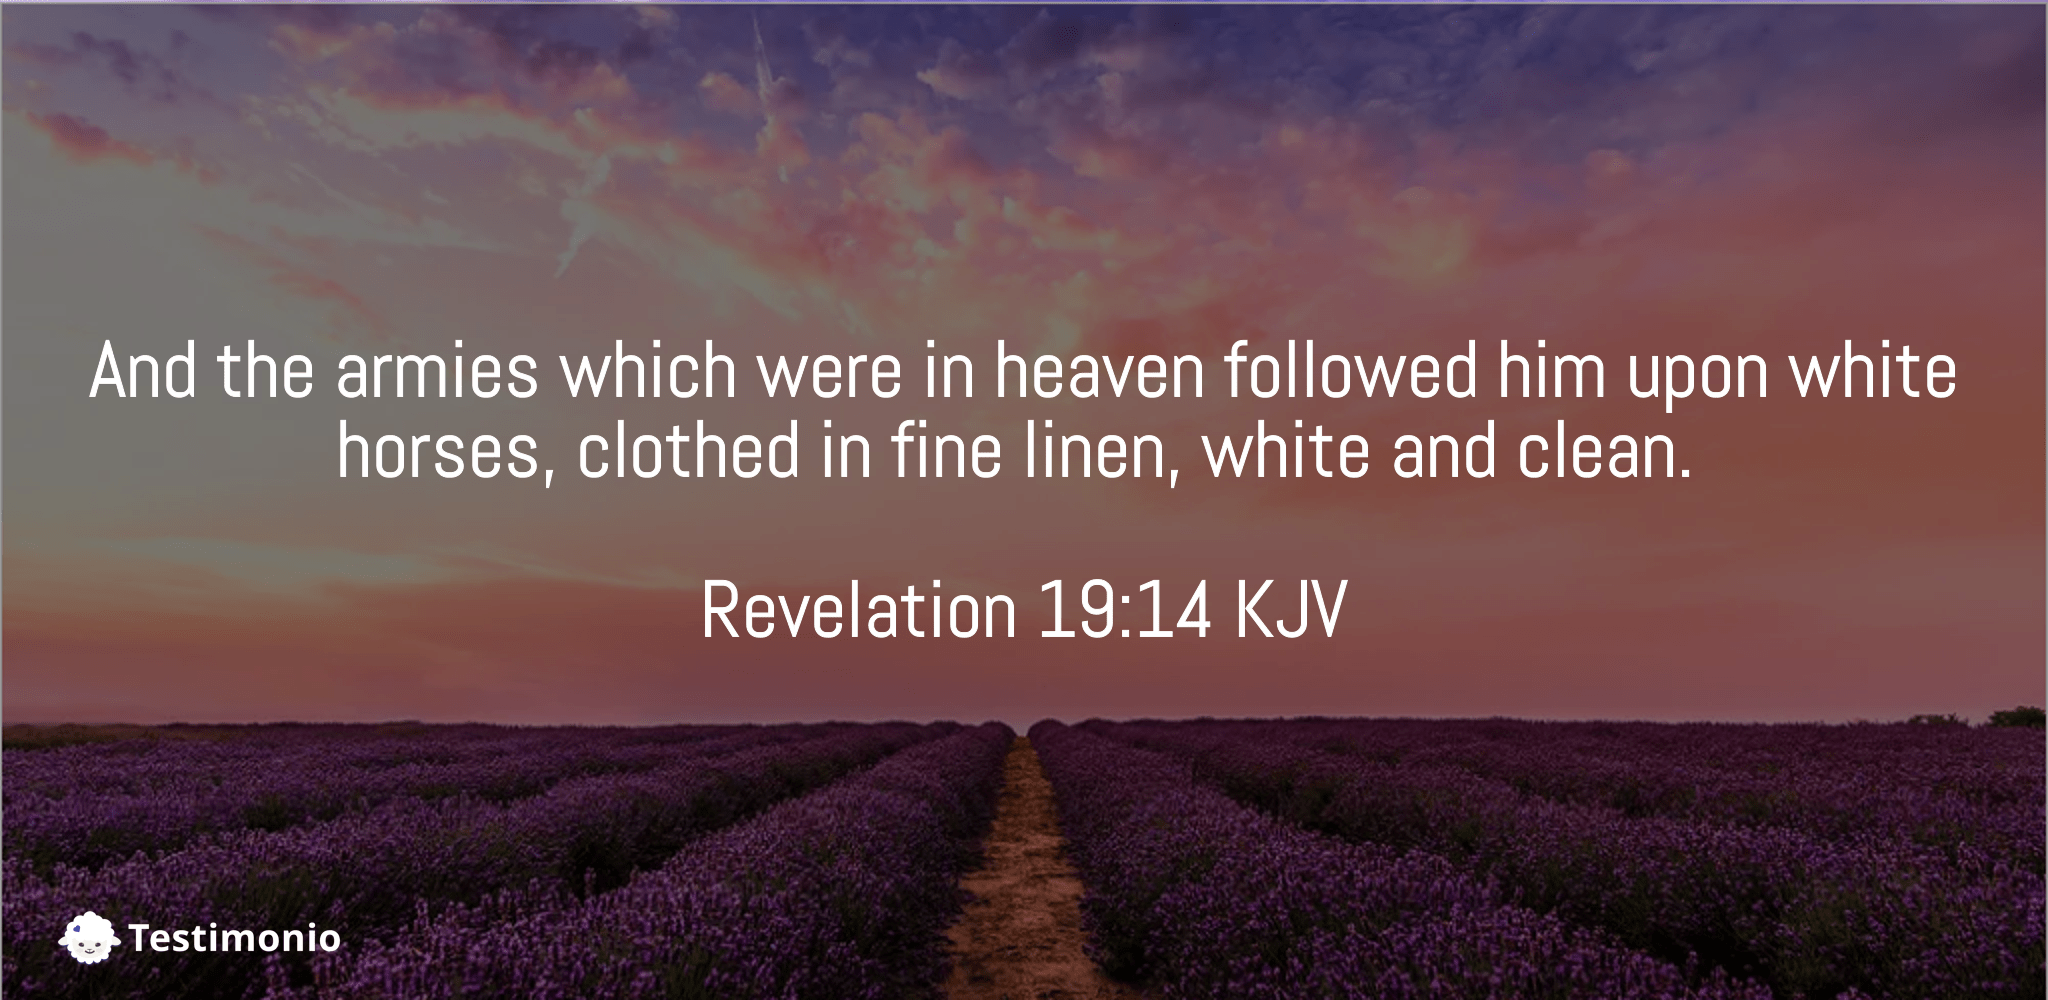 Revelation 19:14